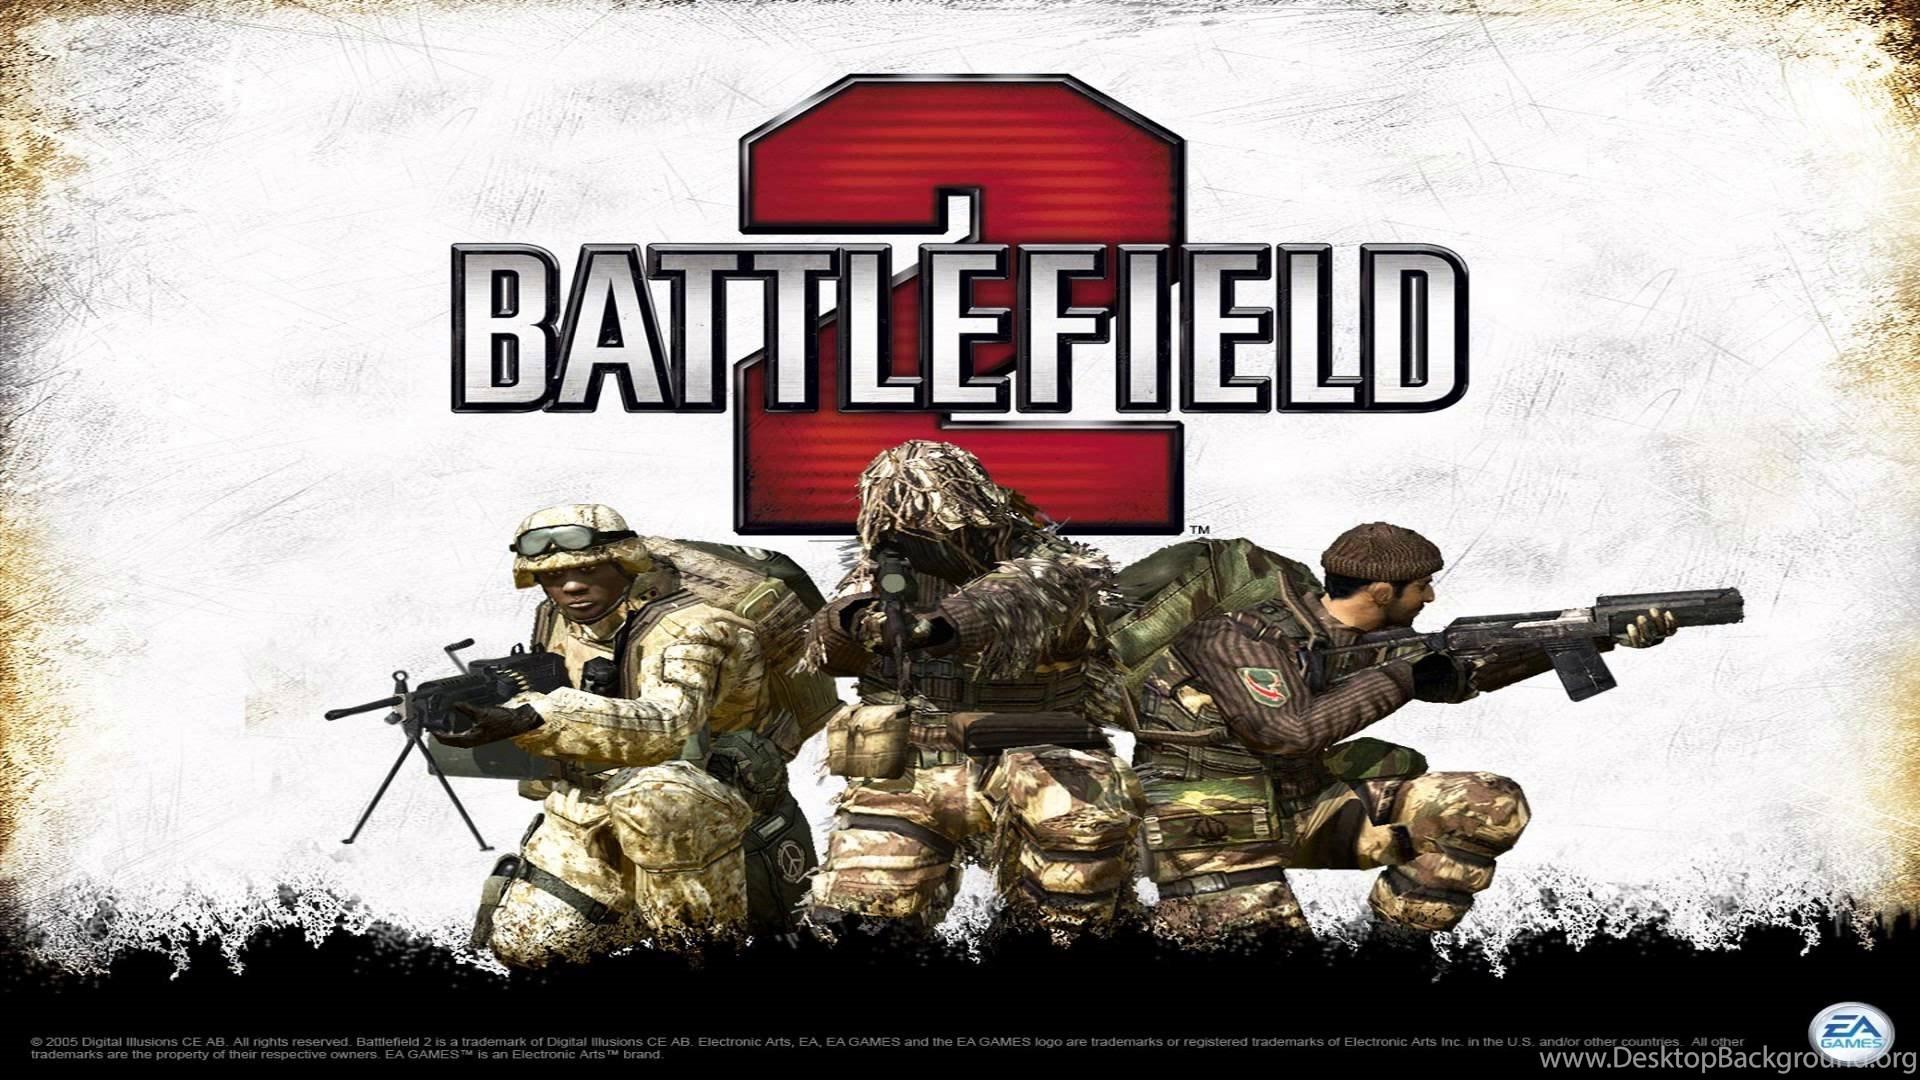 battlefield 2 theme [1080p] youtube desktop background